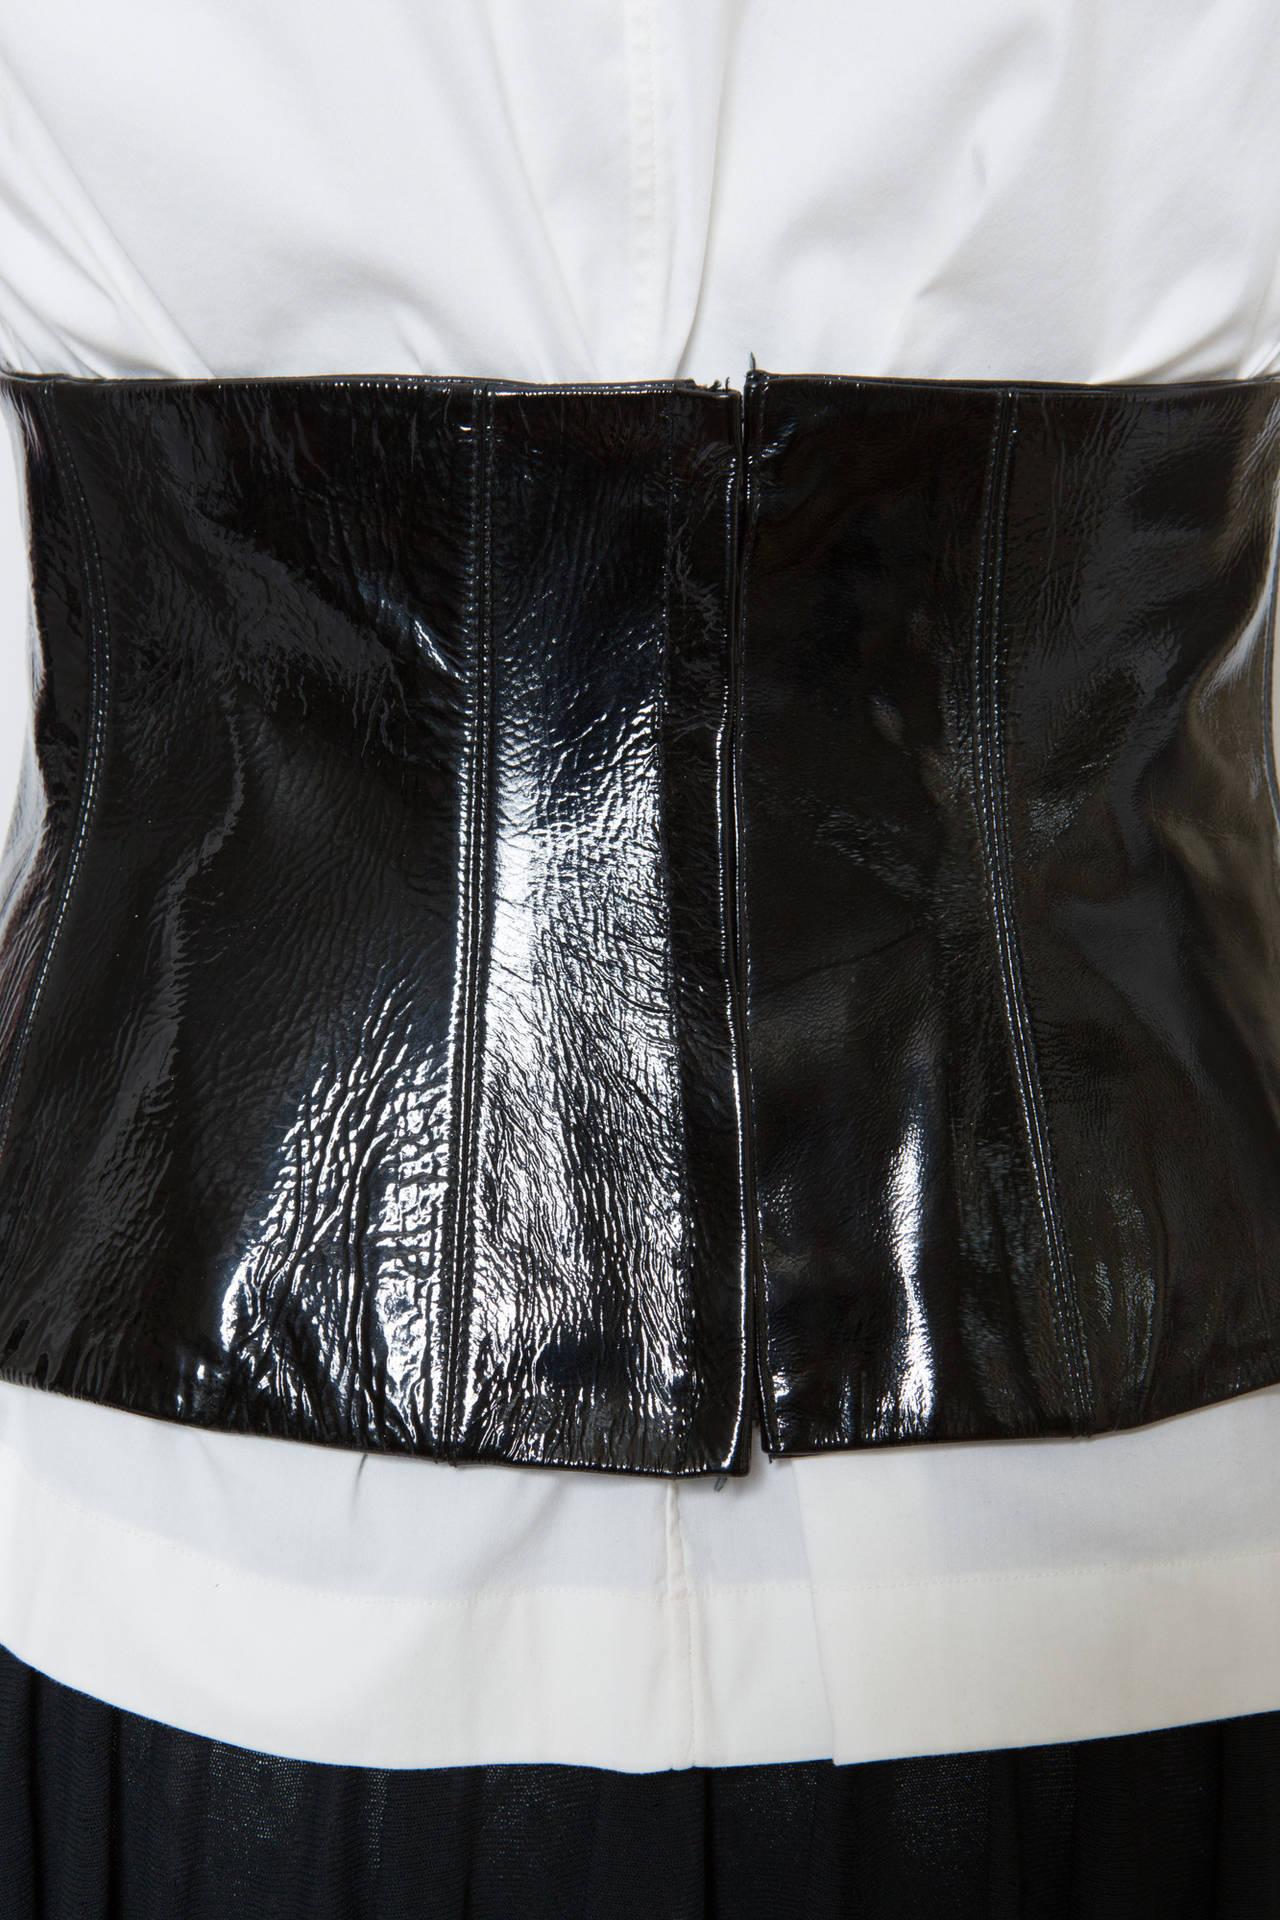 Chanel White Shirt With Black Vinyl Leather Corset Belt 7